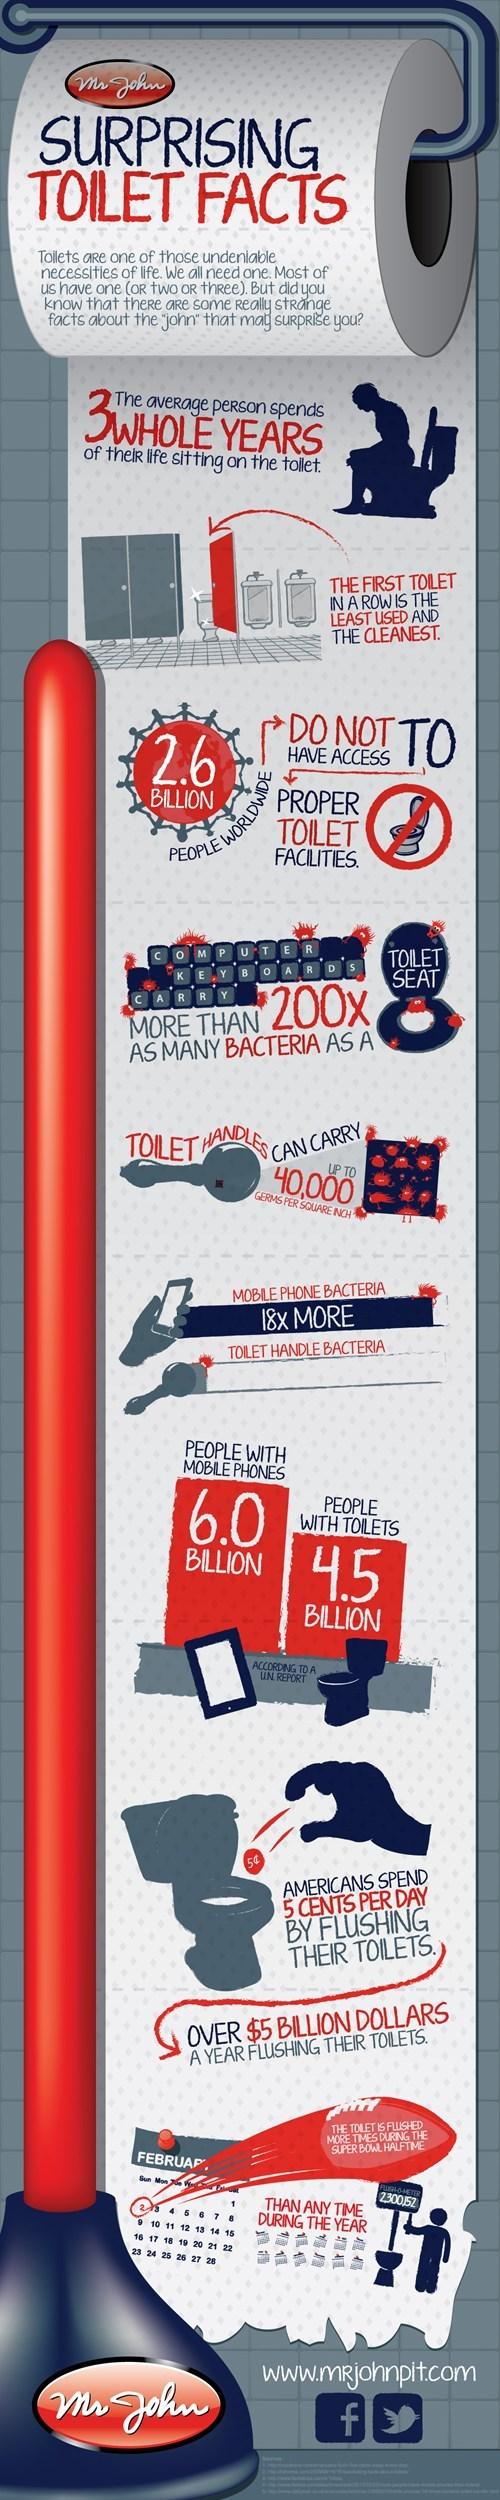 Surprising Toilet Facts